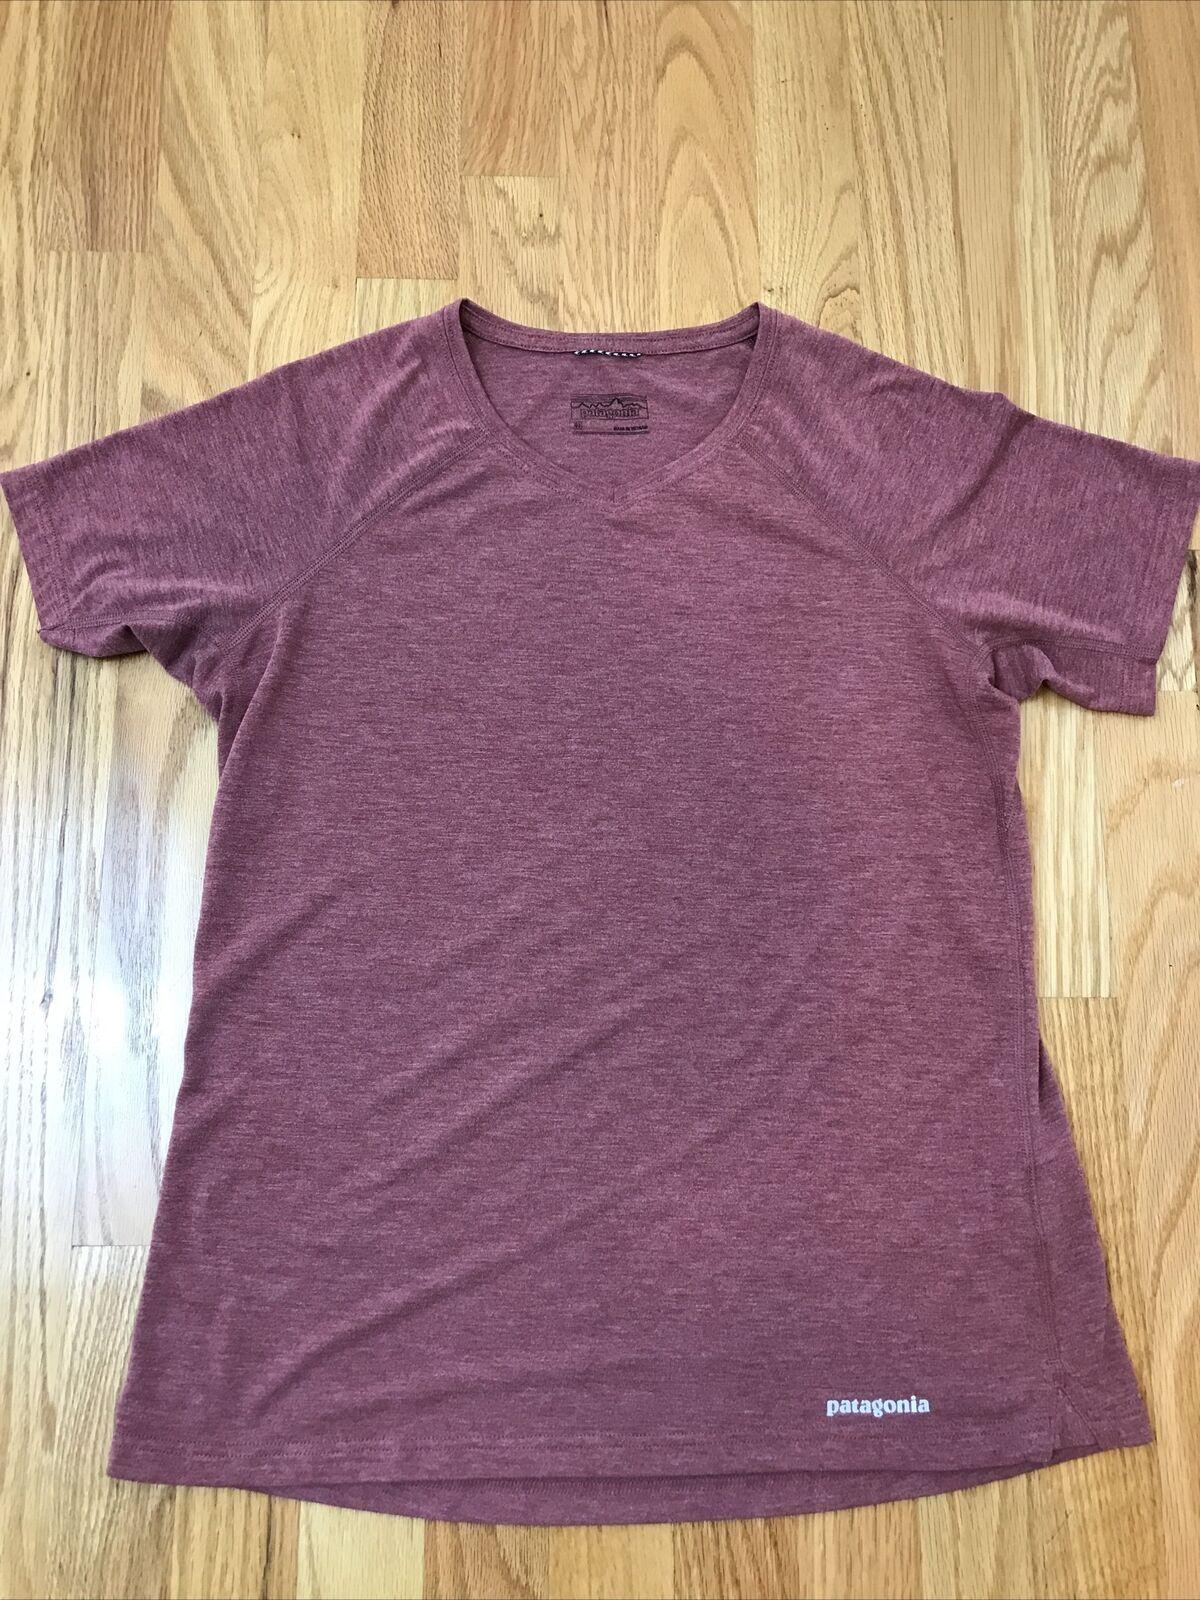 Patagonia Women's Running V-Neck T Shirt Pink Athletic Yoga Gym Sz Medium